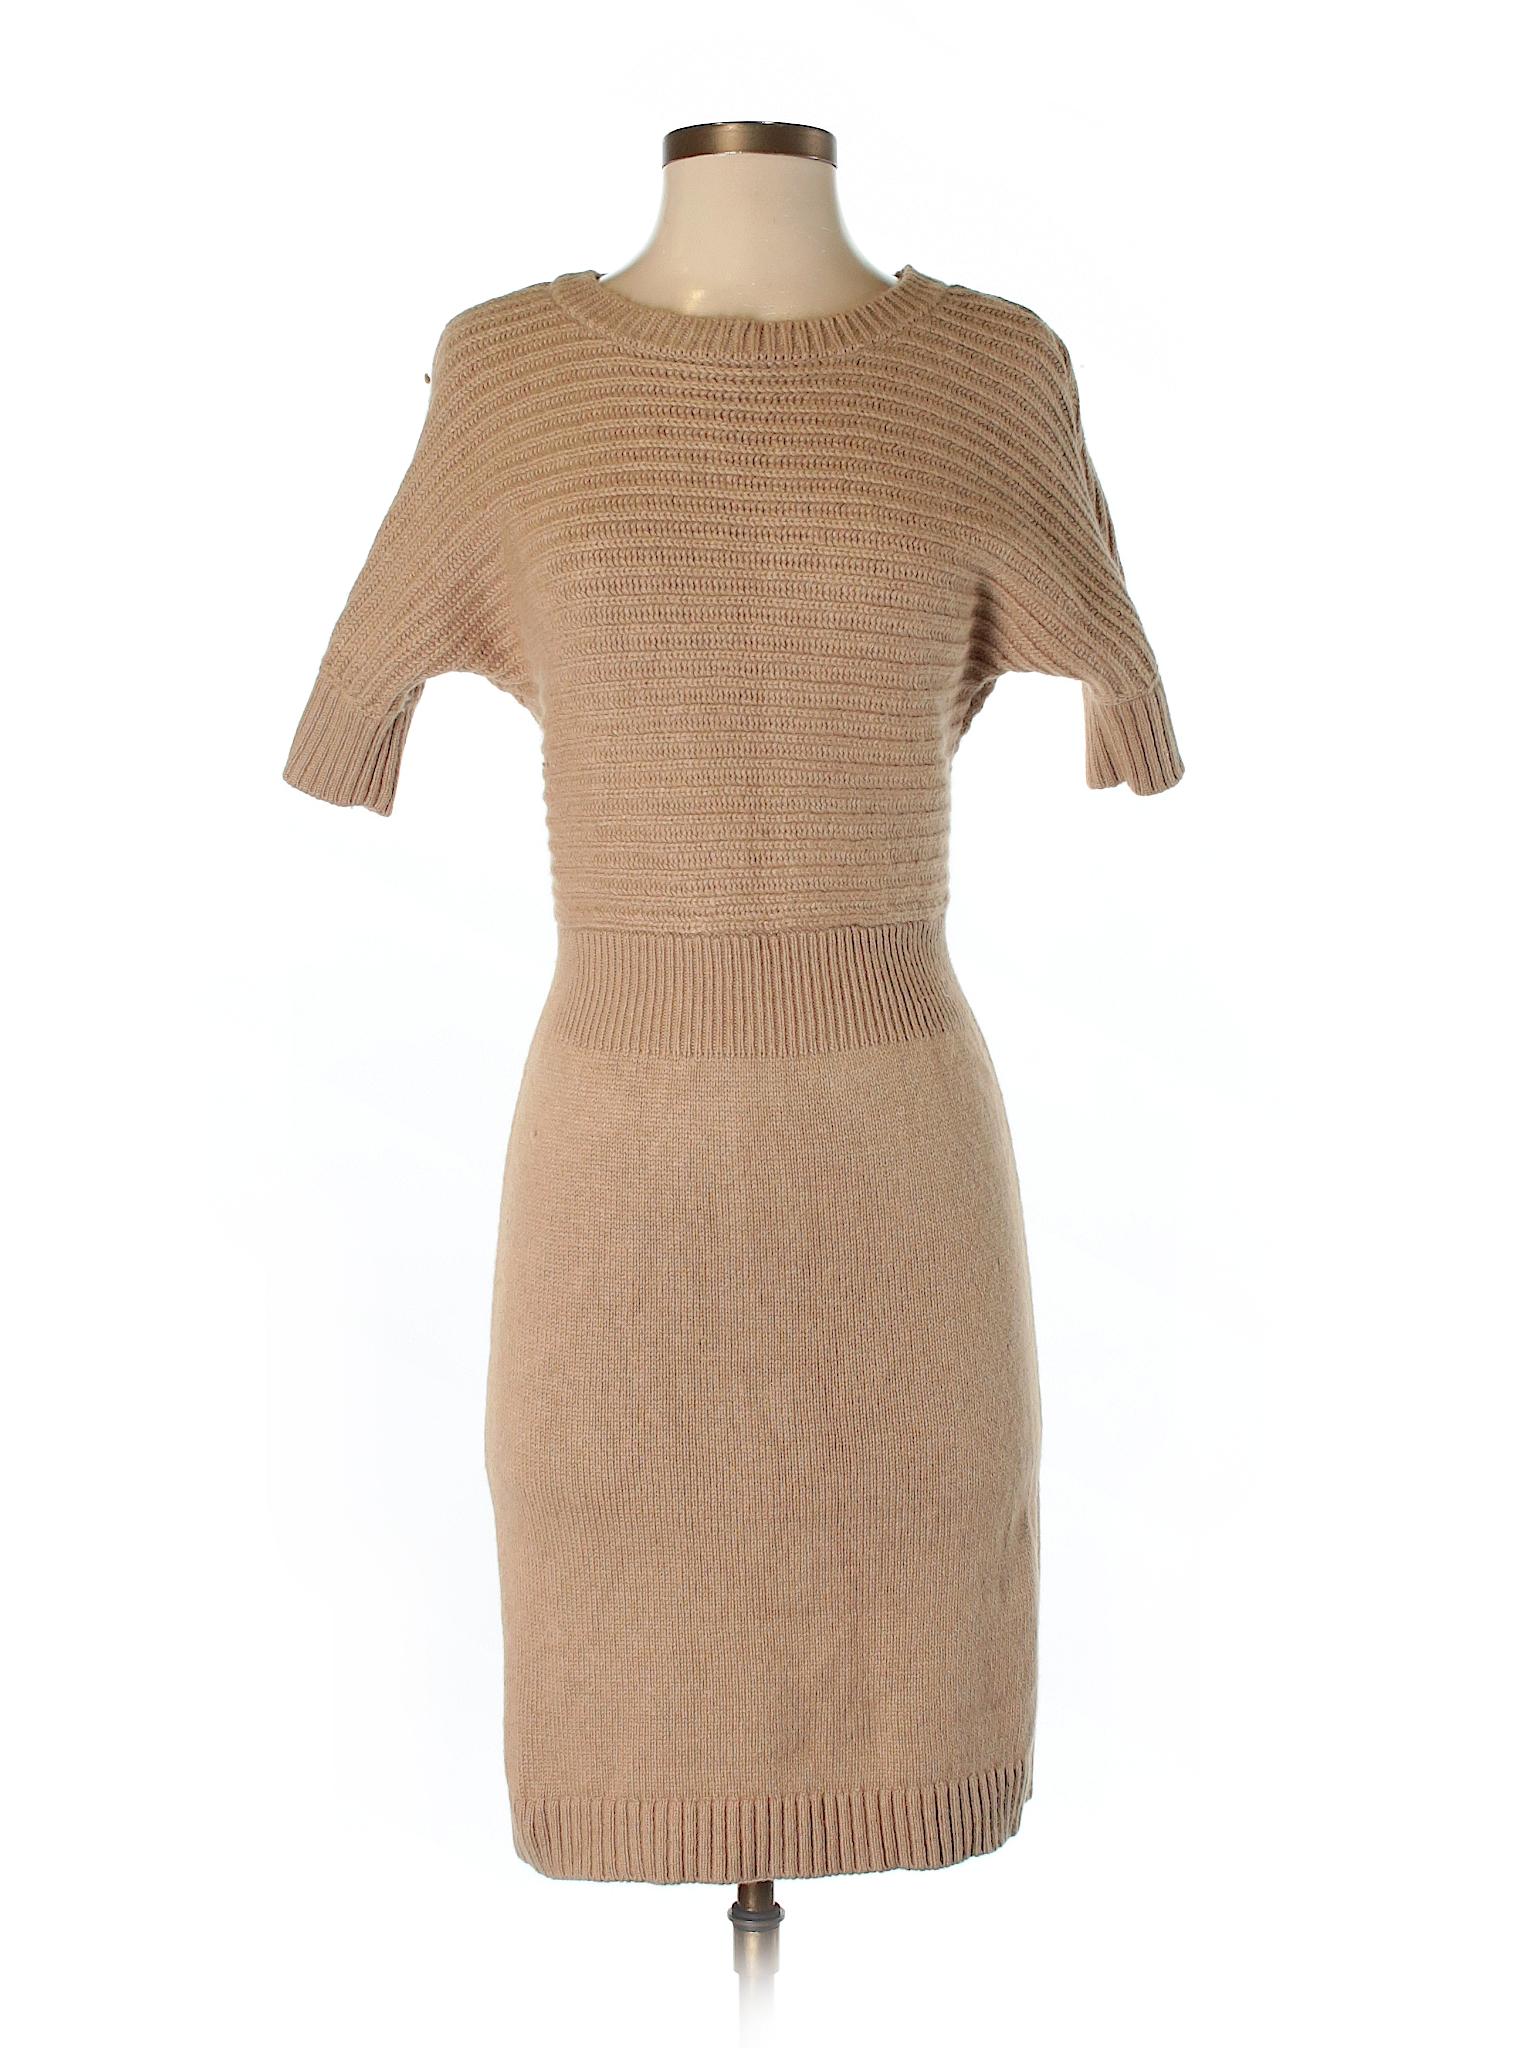 Taylor Ann LOFT Selling Dress Casual 5aBUxwqw6